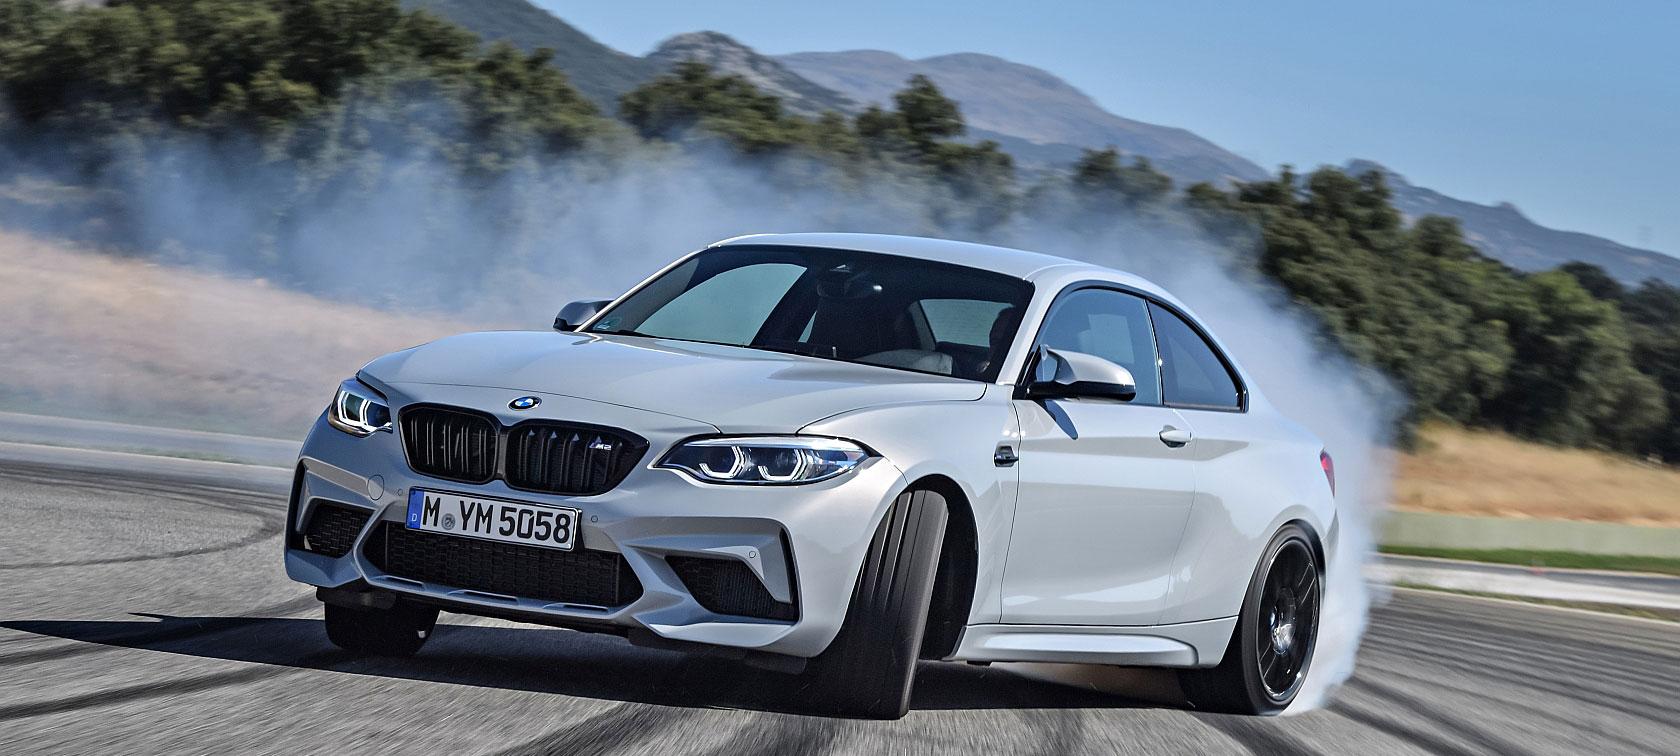 מתוחכם The new BMW M2 Competition – press reactions KJ-38